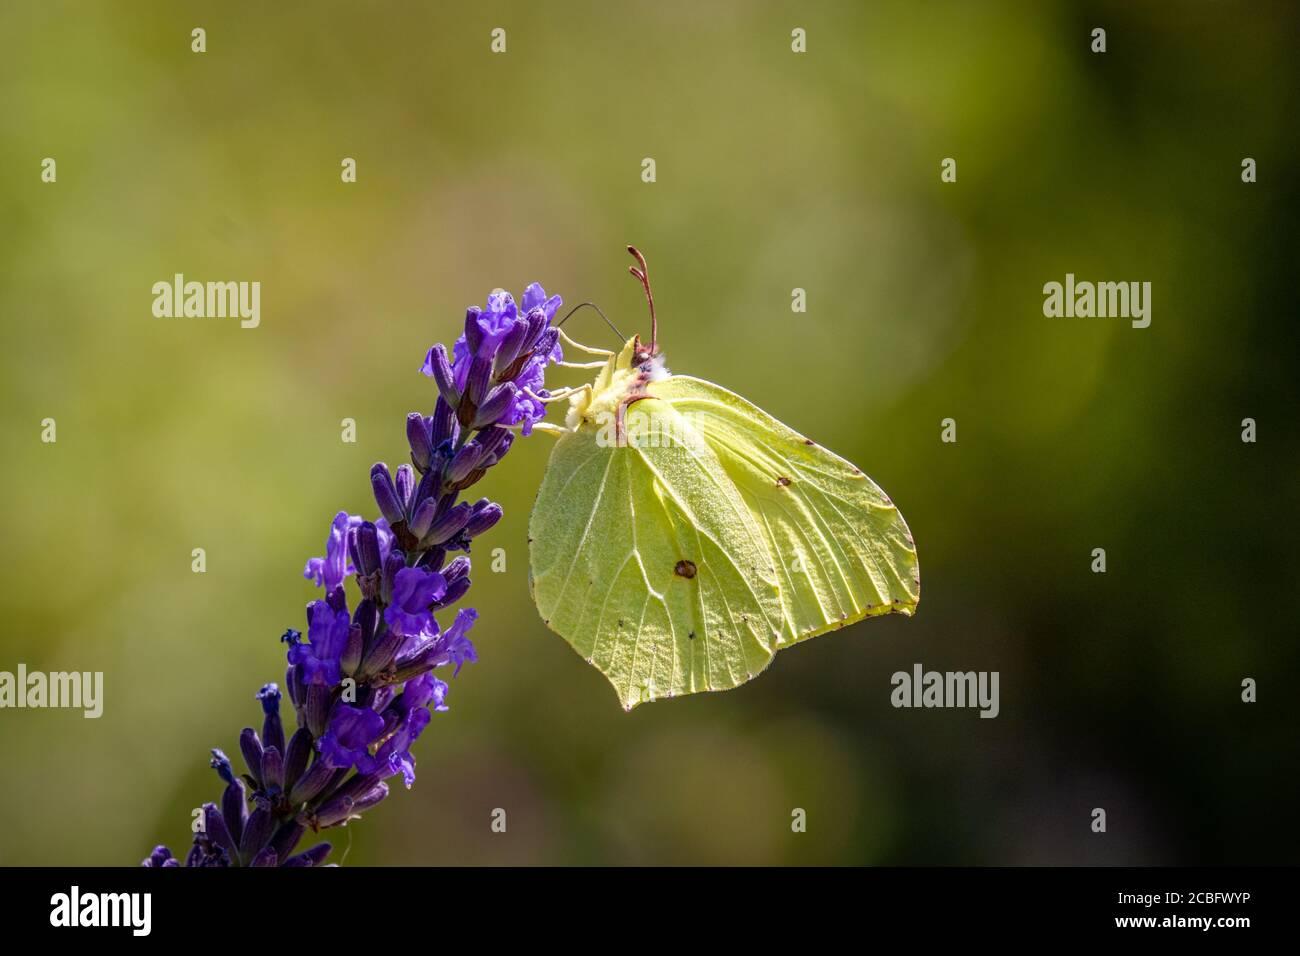 A Common brimstone butterfly (Gonepteryx rhamni) on Lavender Stock Photo